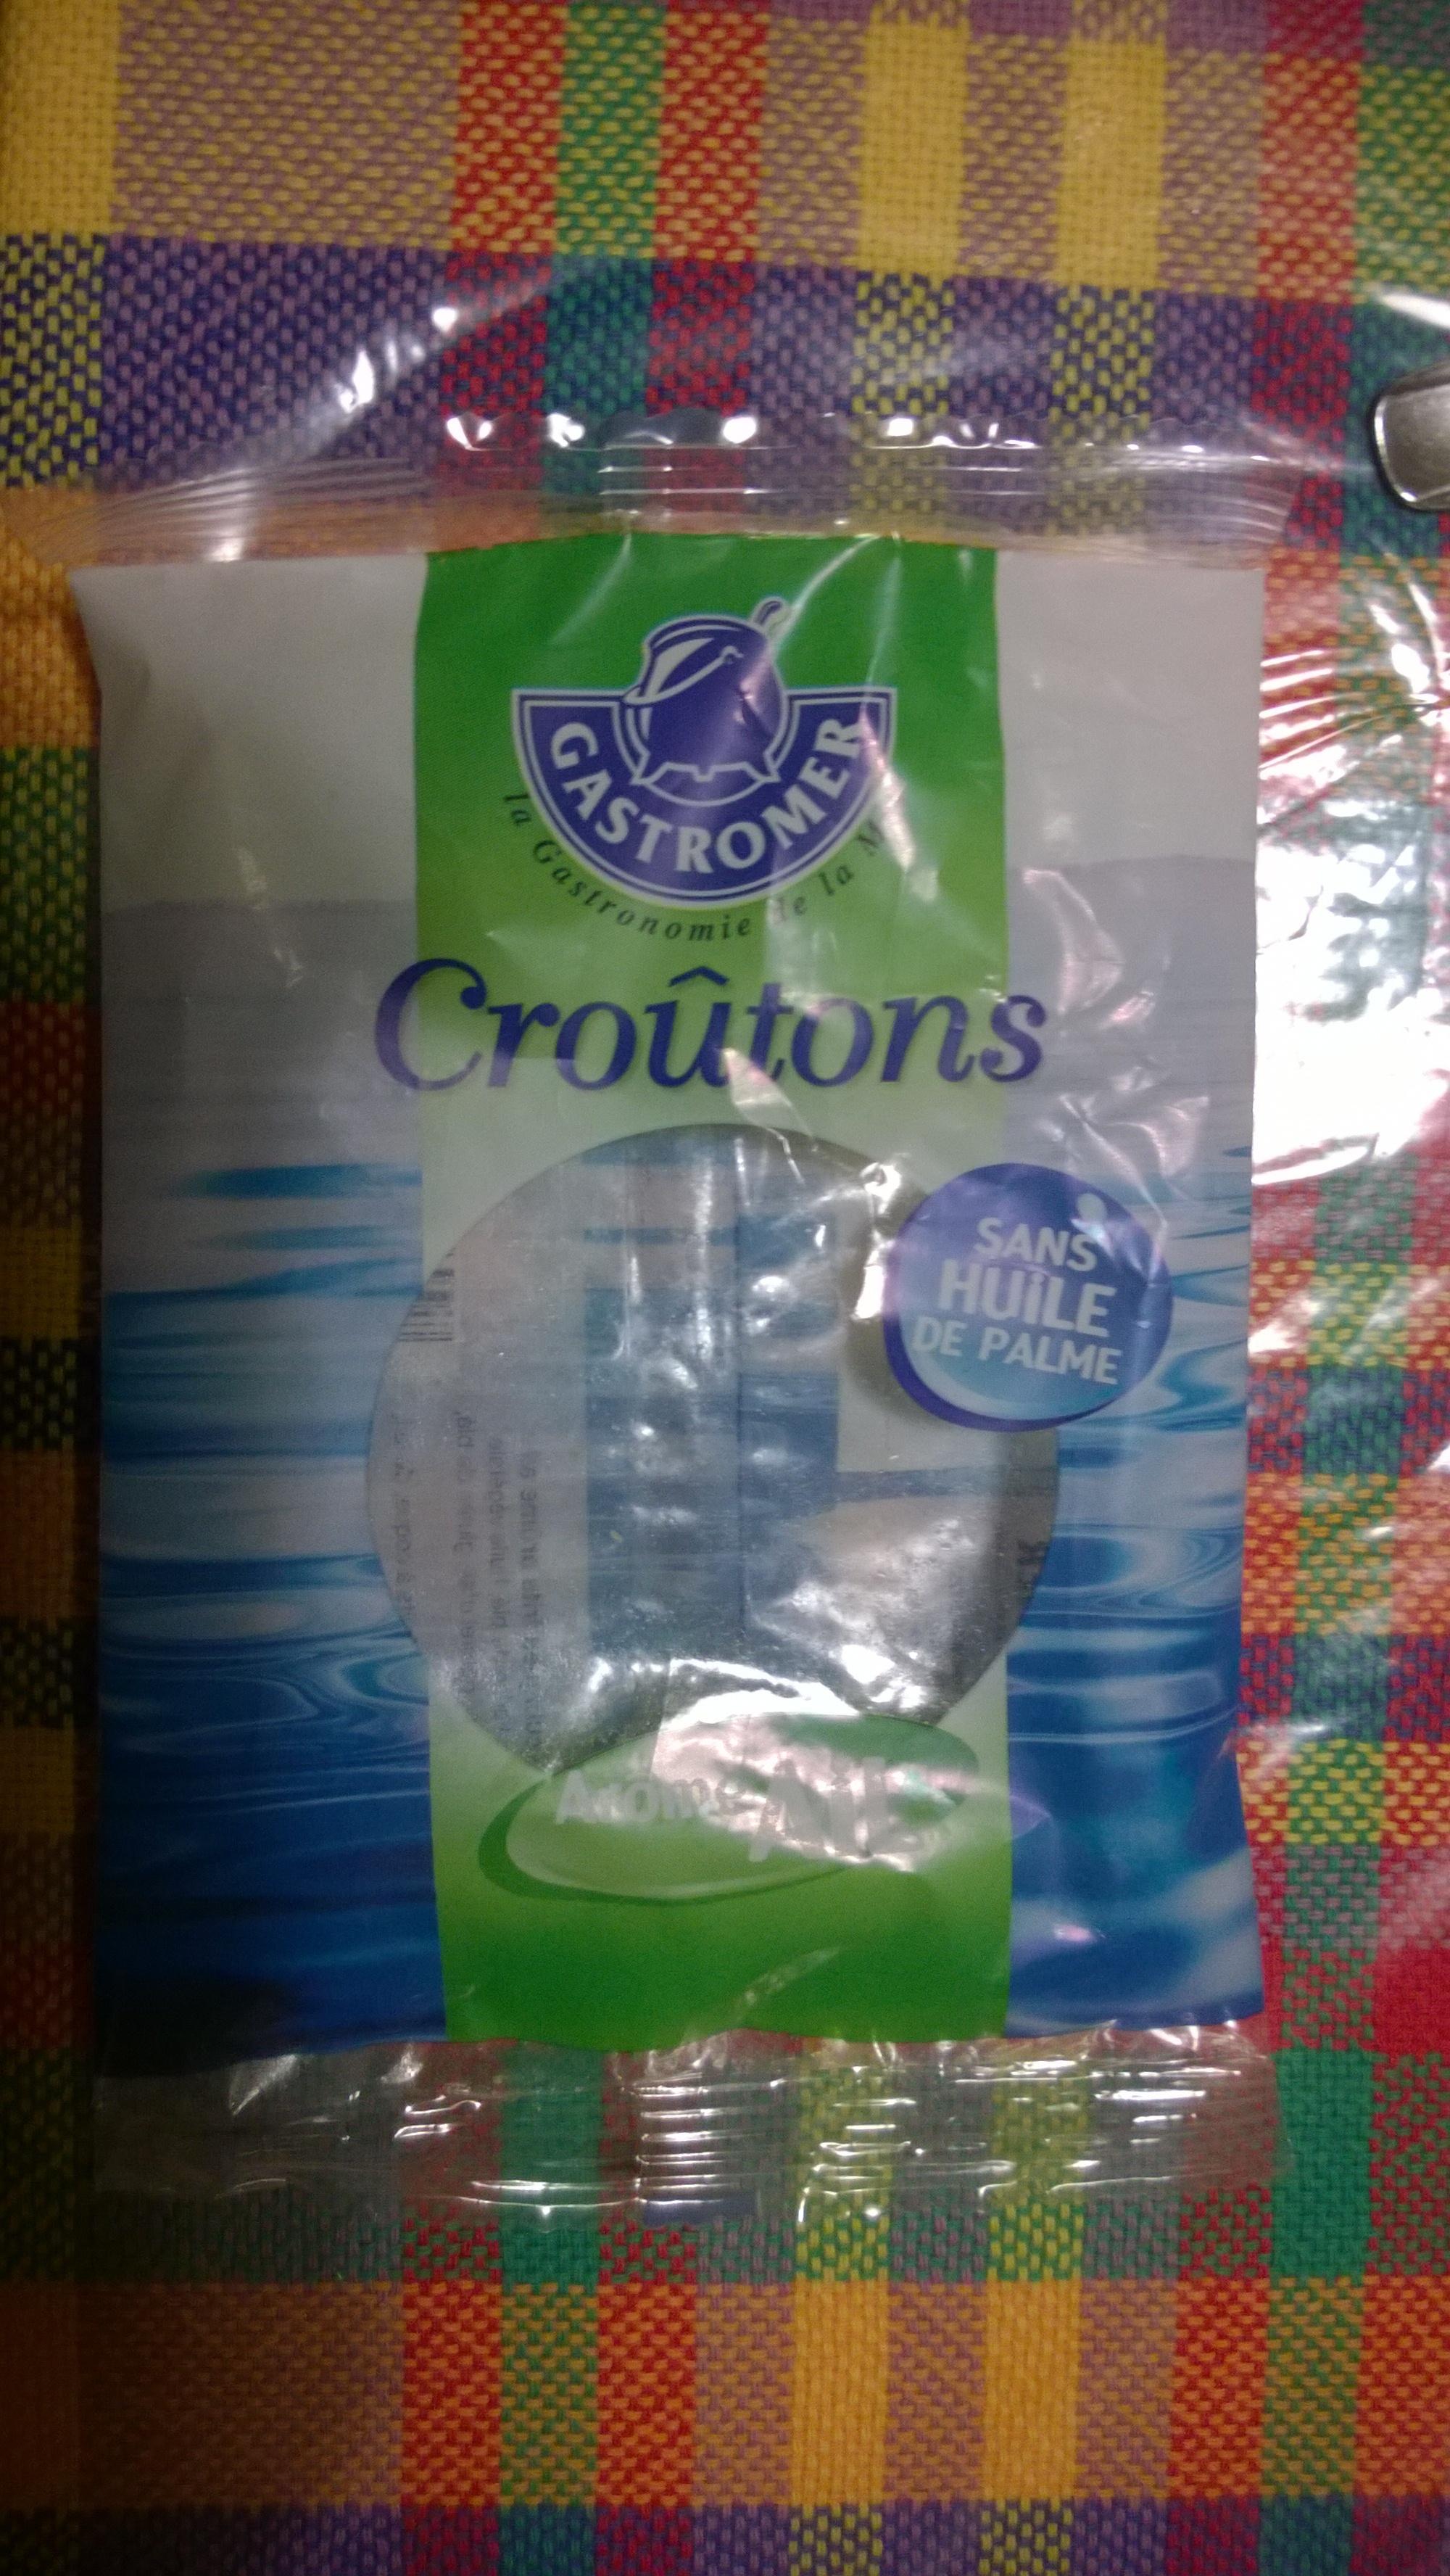 Croûtons - Produit - fr